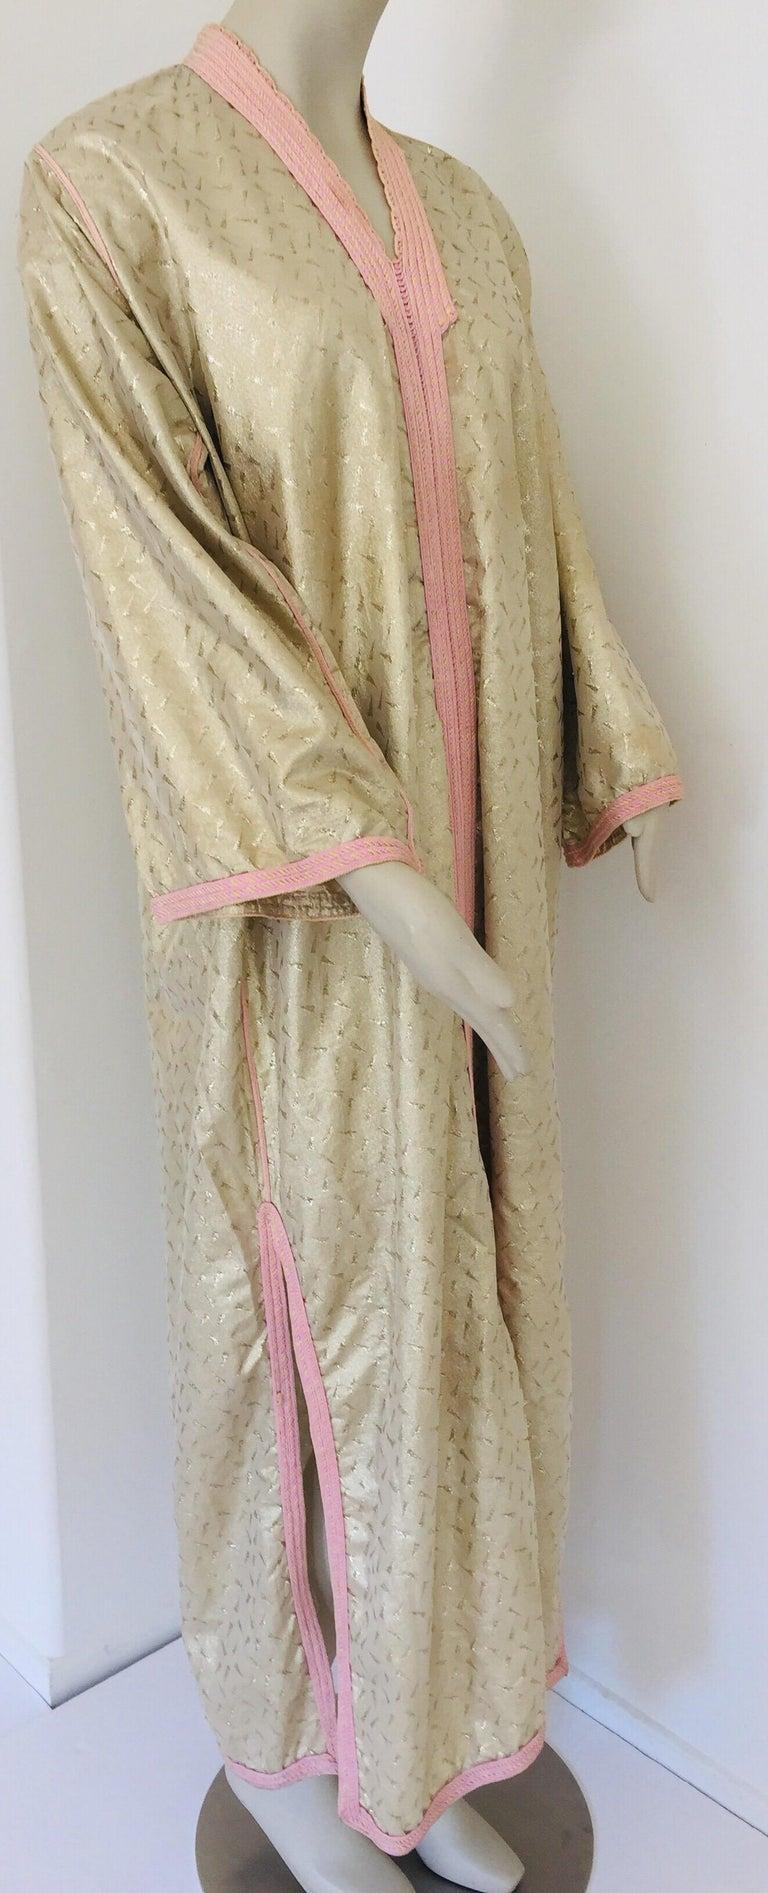 1970s Metallic Gold Moroccan Caftan, Kaftan Maxi Dress North Africa, Morocco For Sale 12